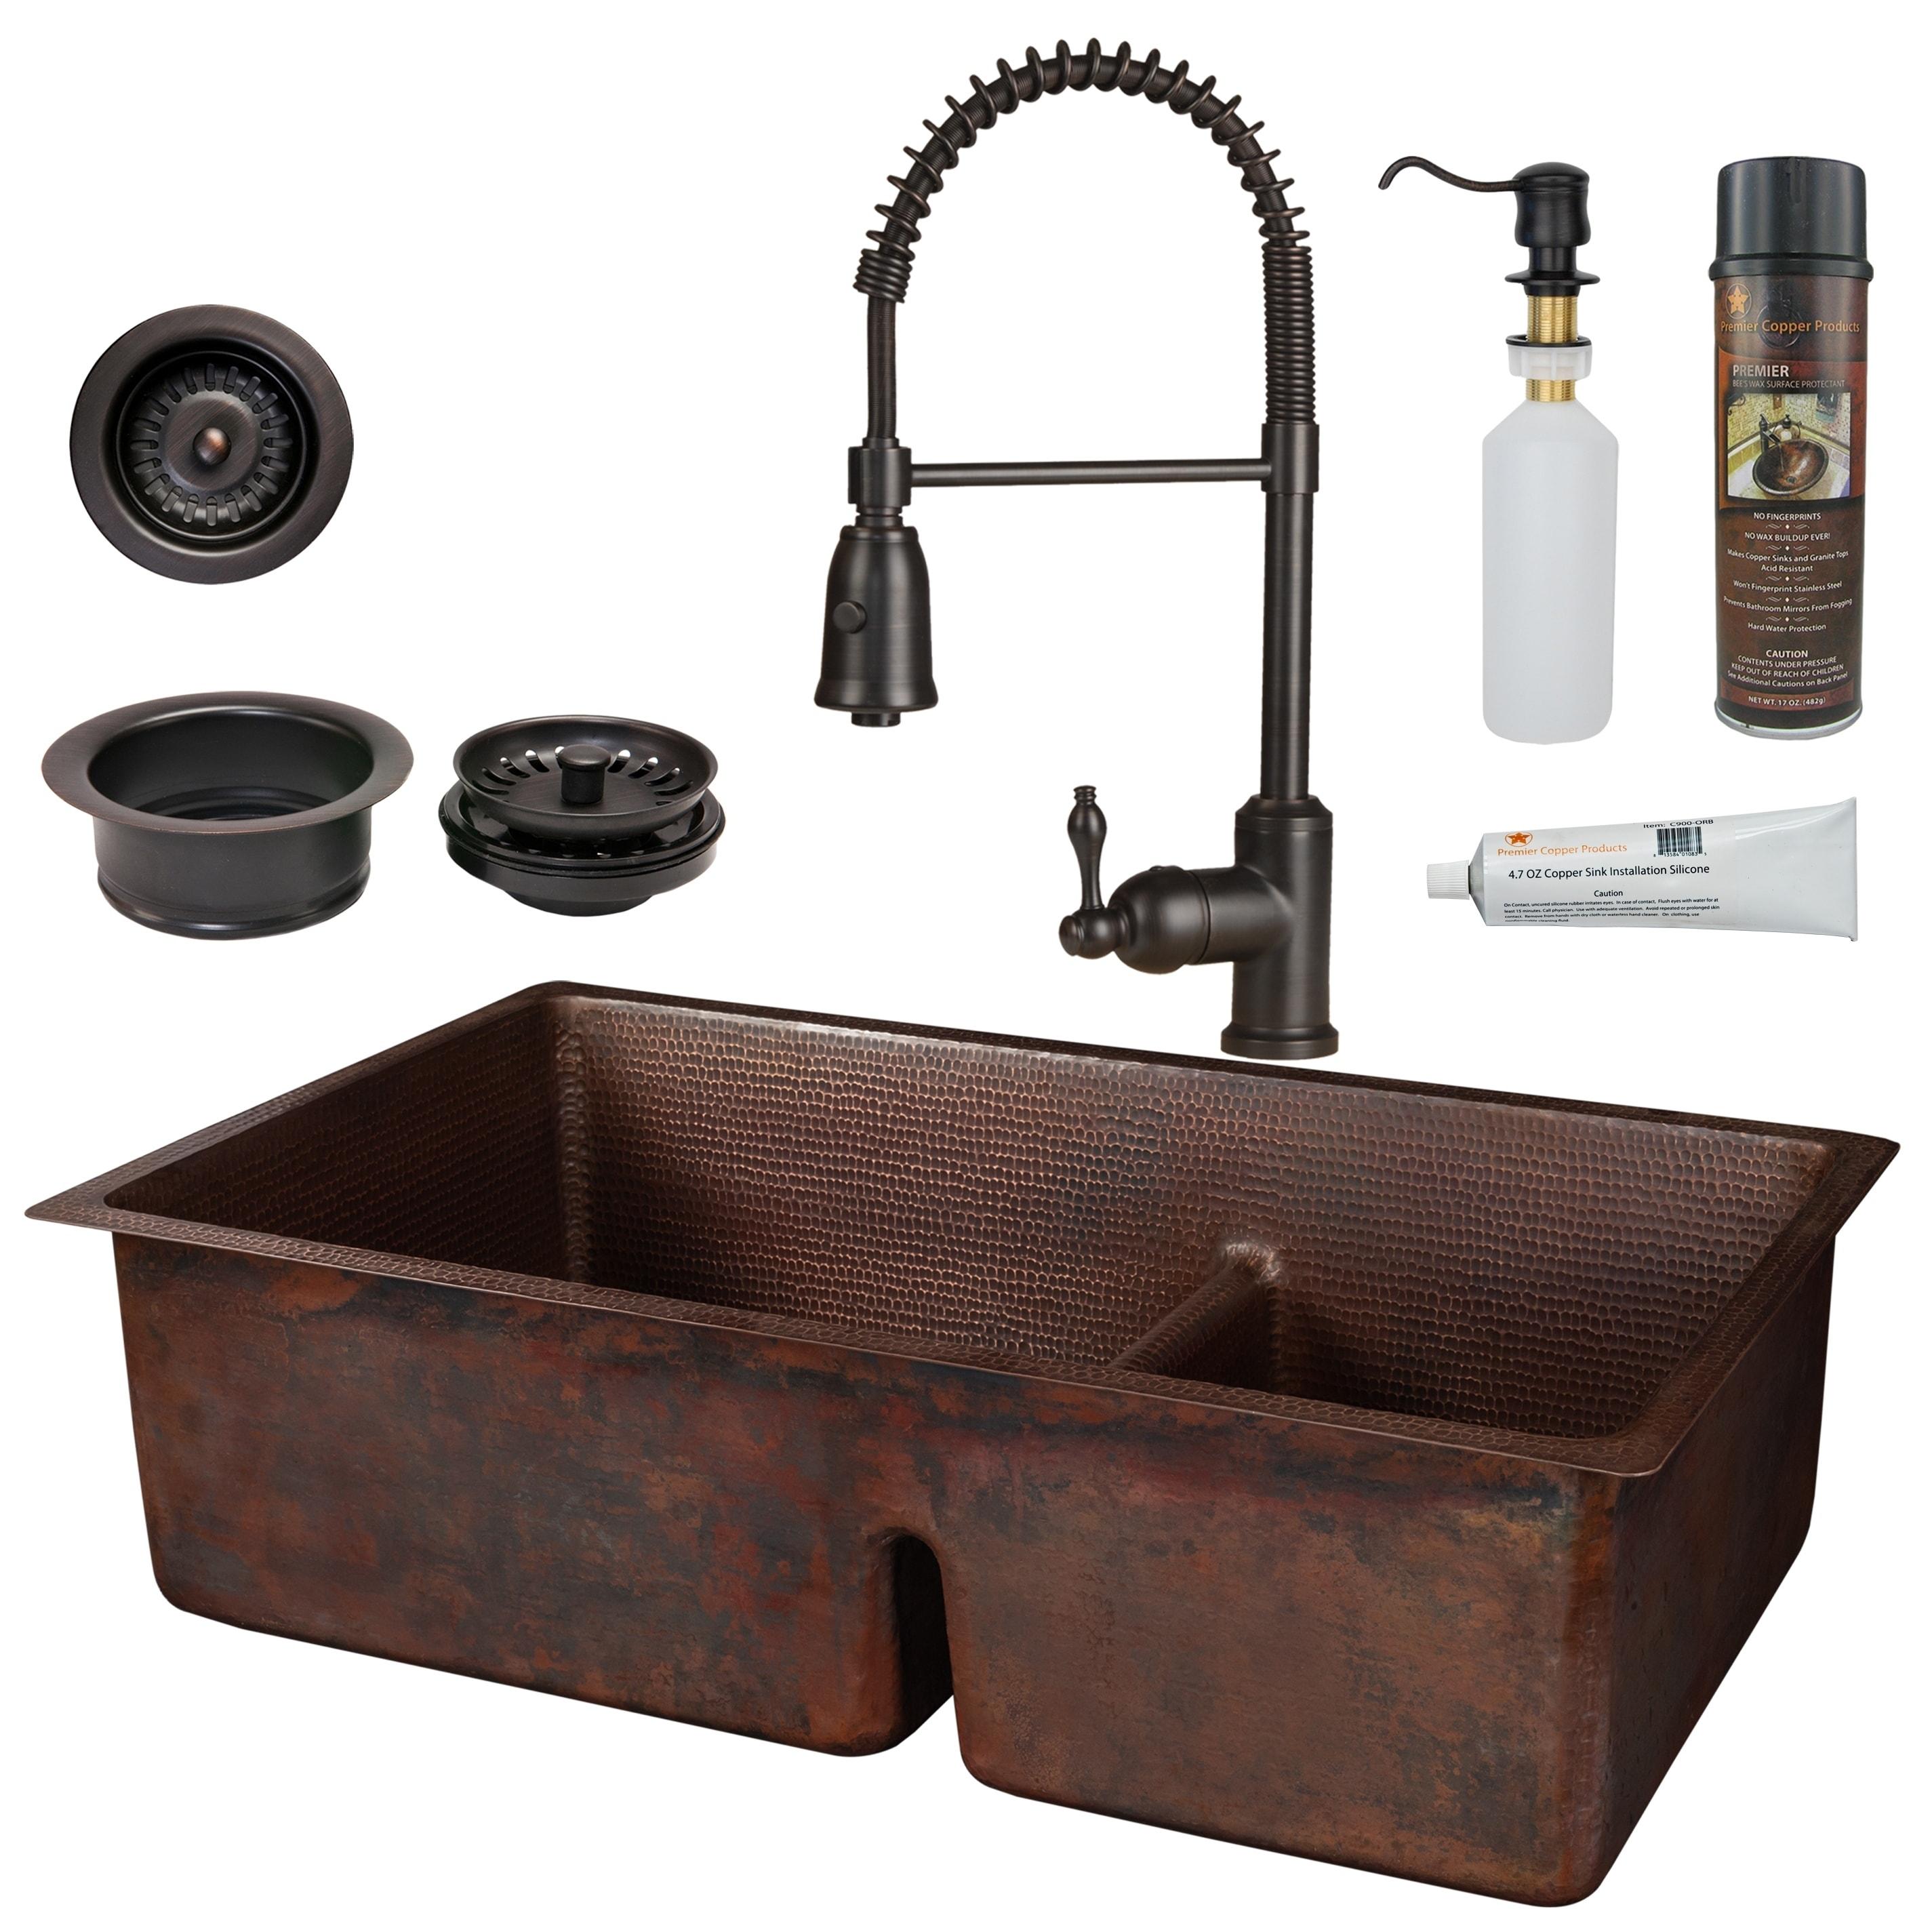 Shop Premier Copper Products Ksp4 K60db33229 Sd5 Kitchen Sink